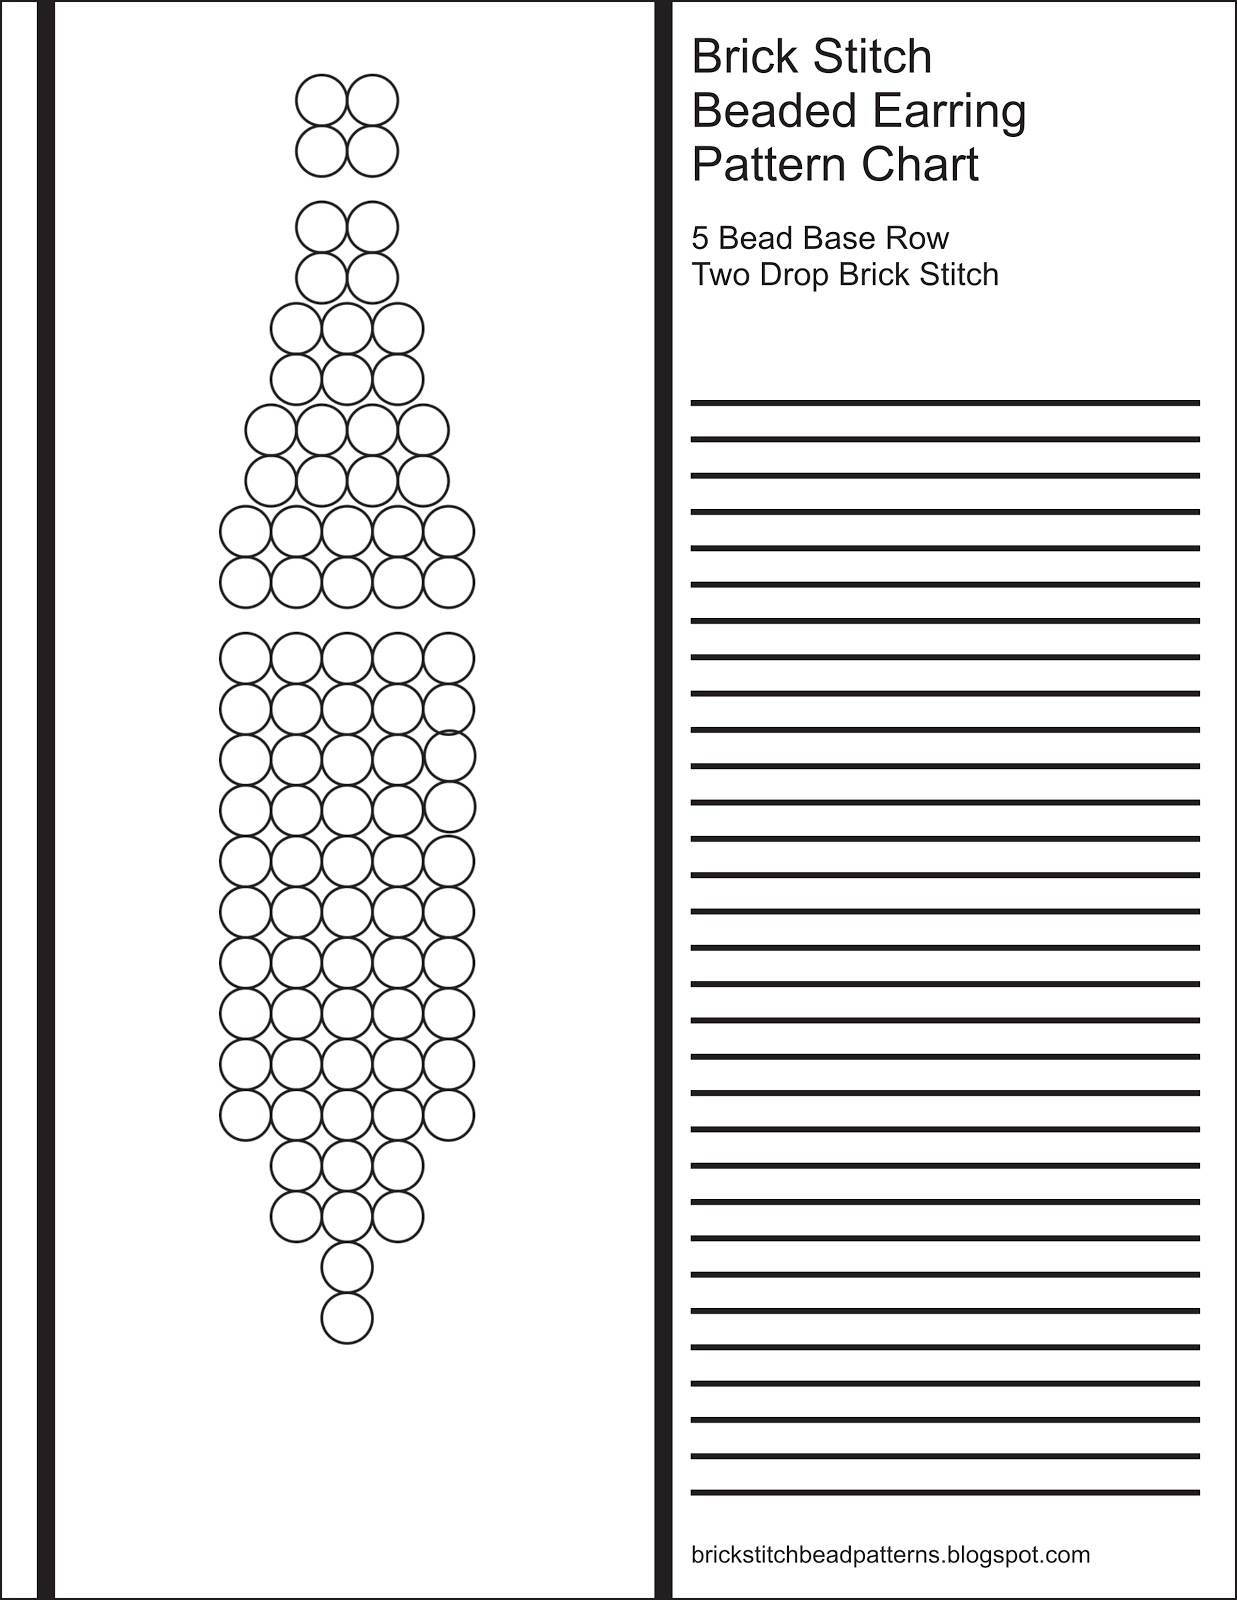 Brick Stitch Bead Patterns Journal 5 Bead Base Row 2 Drop Blank Round Beaded Earring Pattern Chart